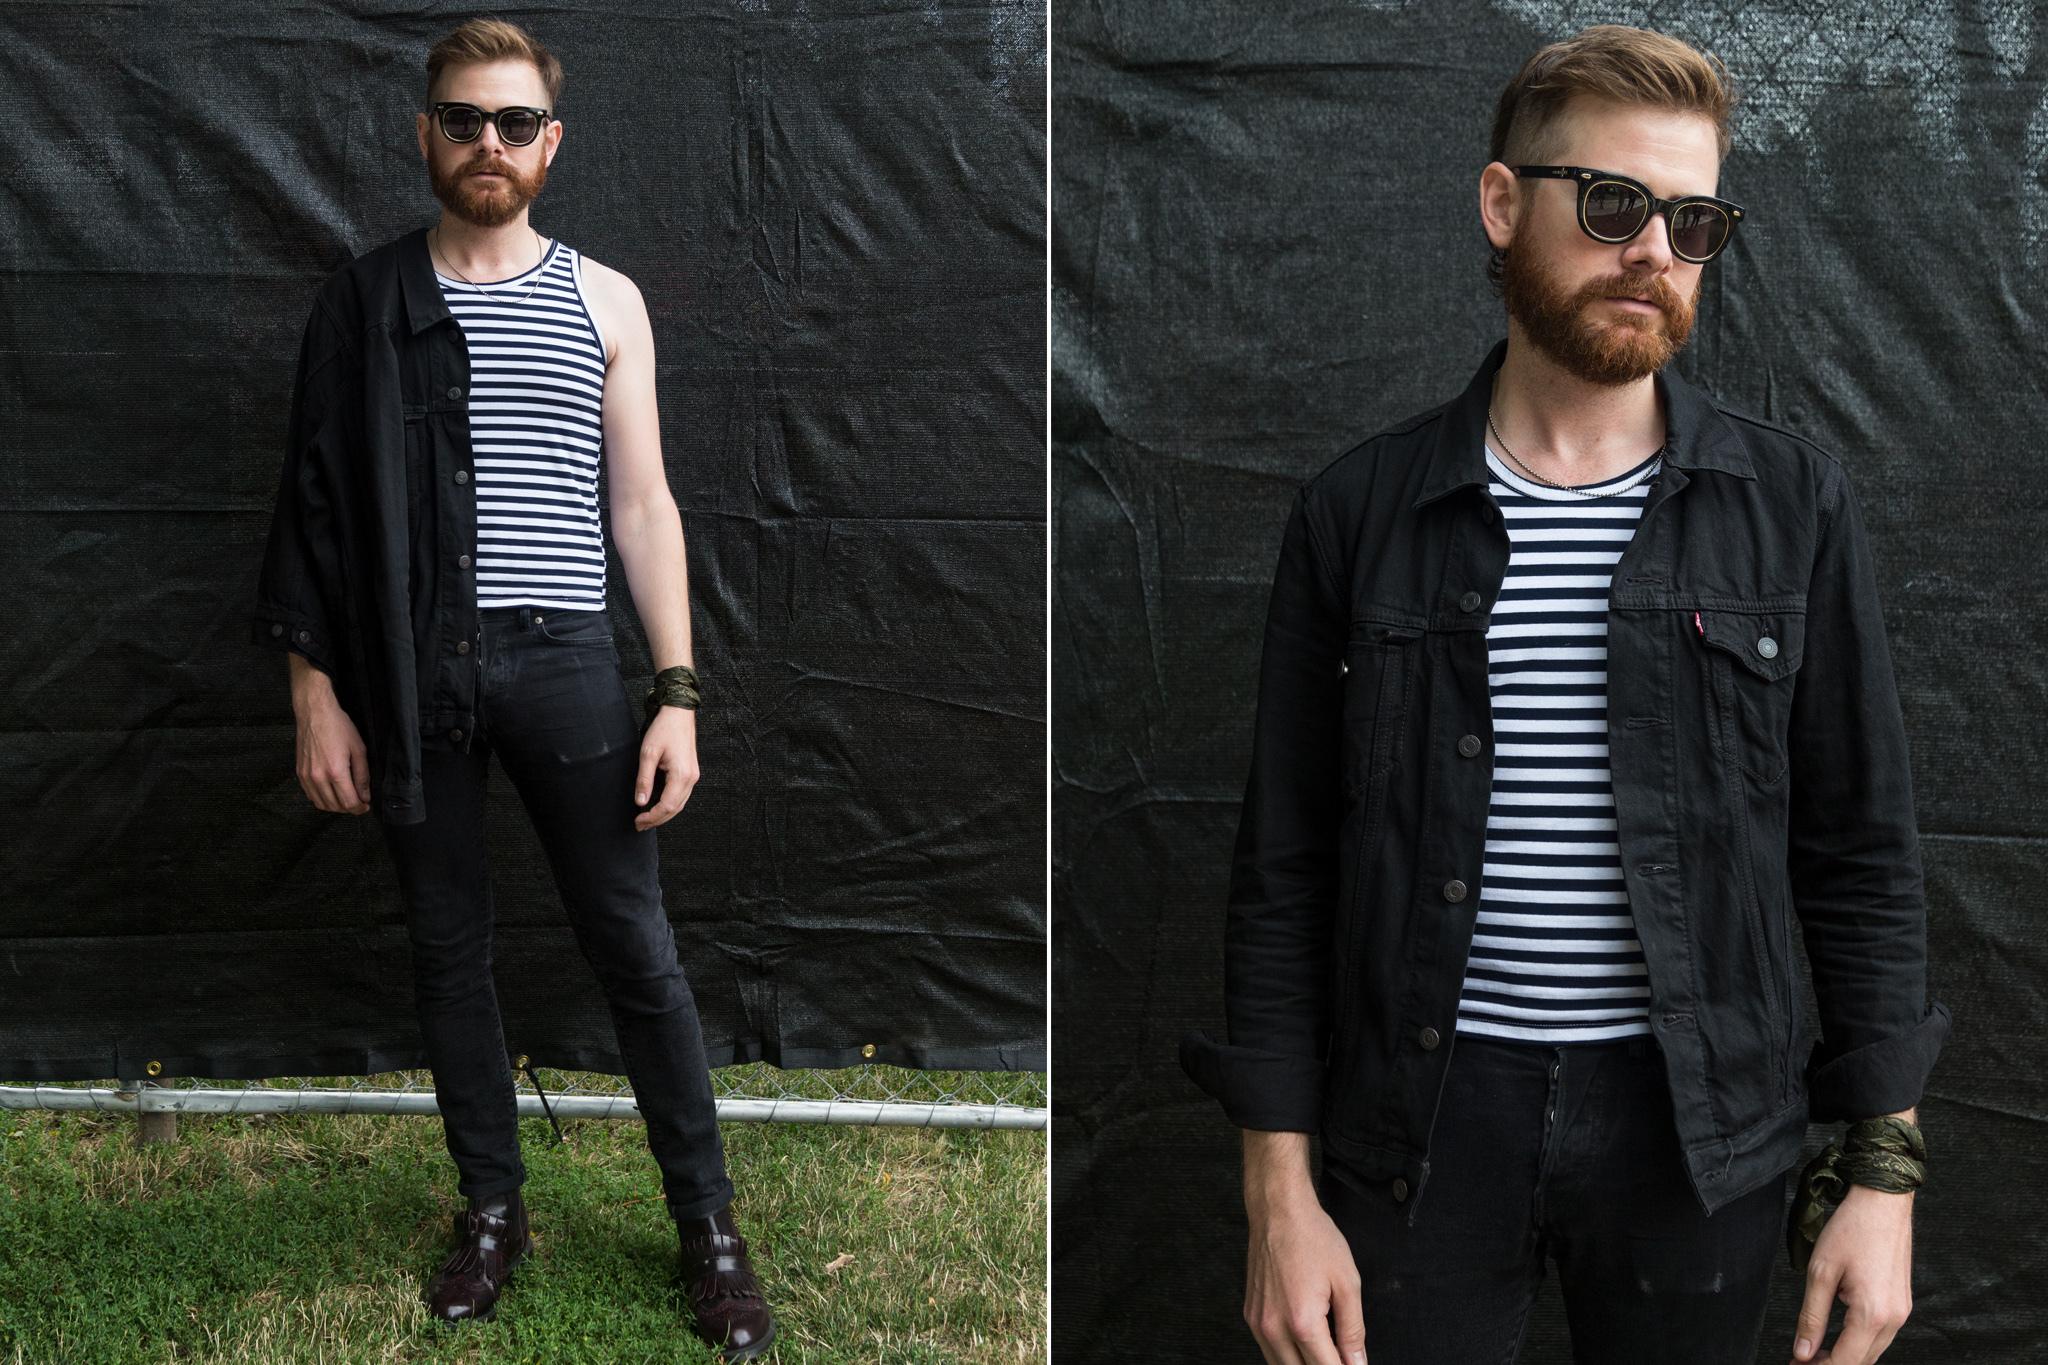 Pitchfork Music Festival, fashions, jaclyn rivas